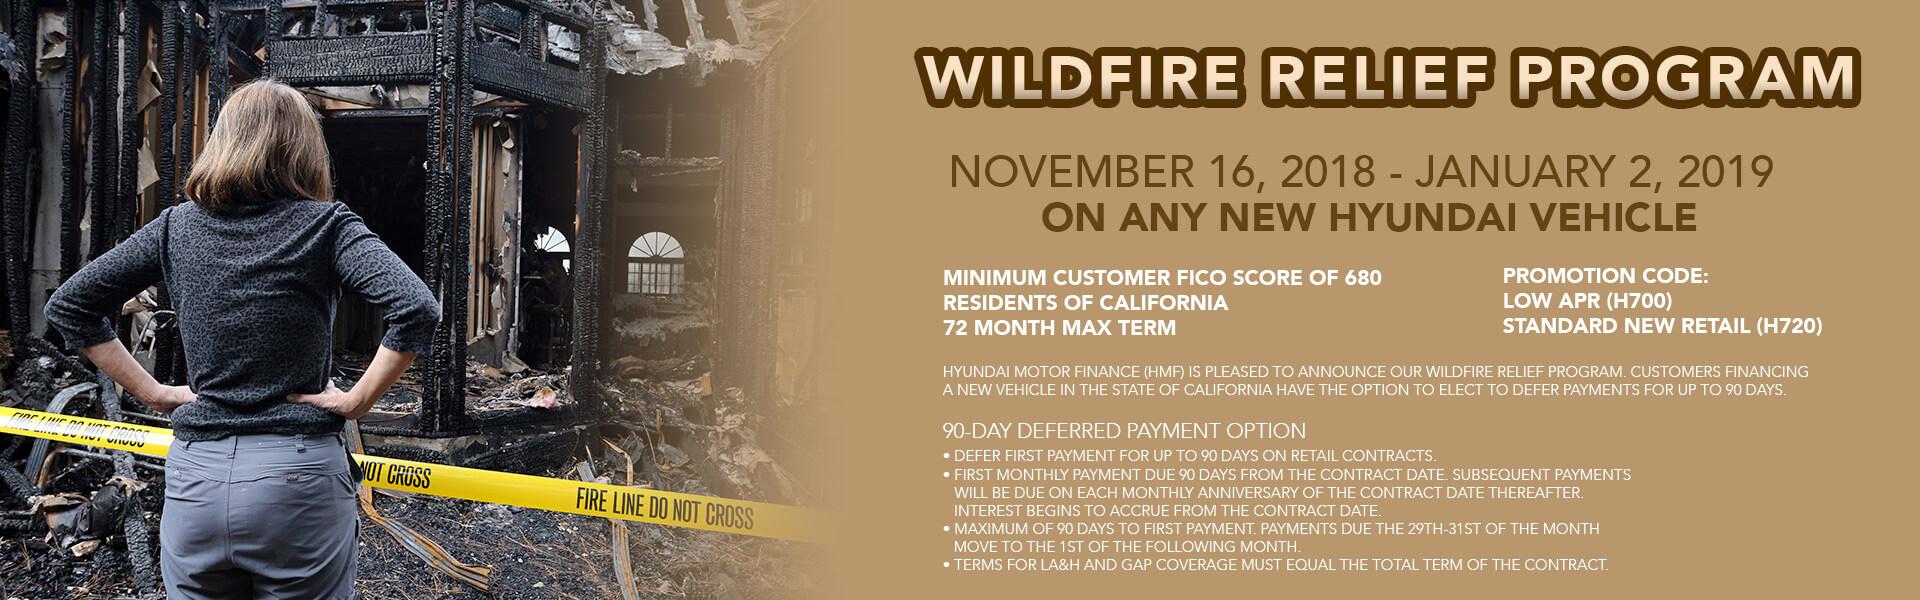 Wildfire Relief Program